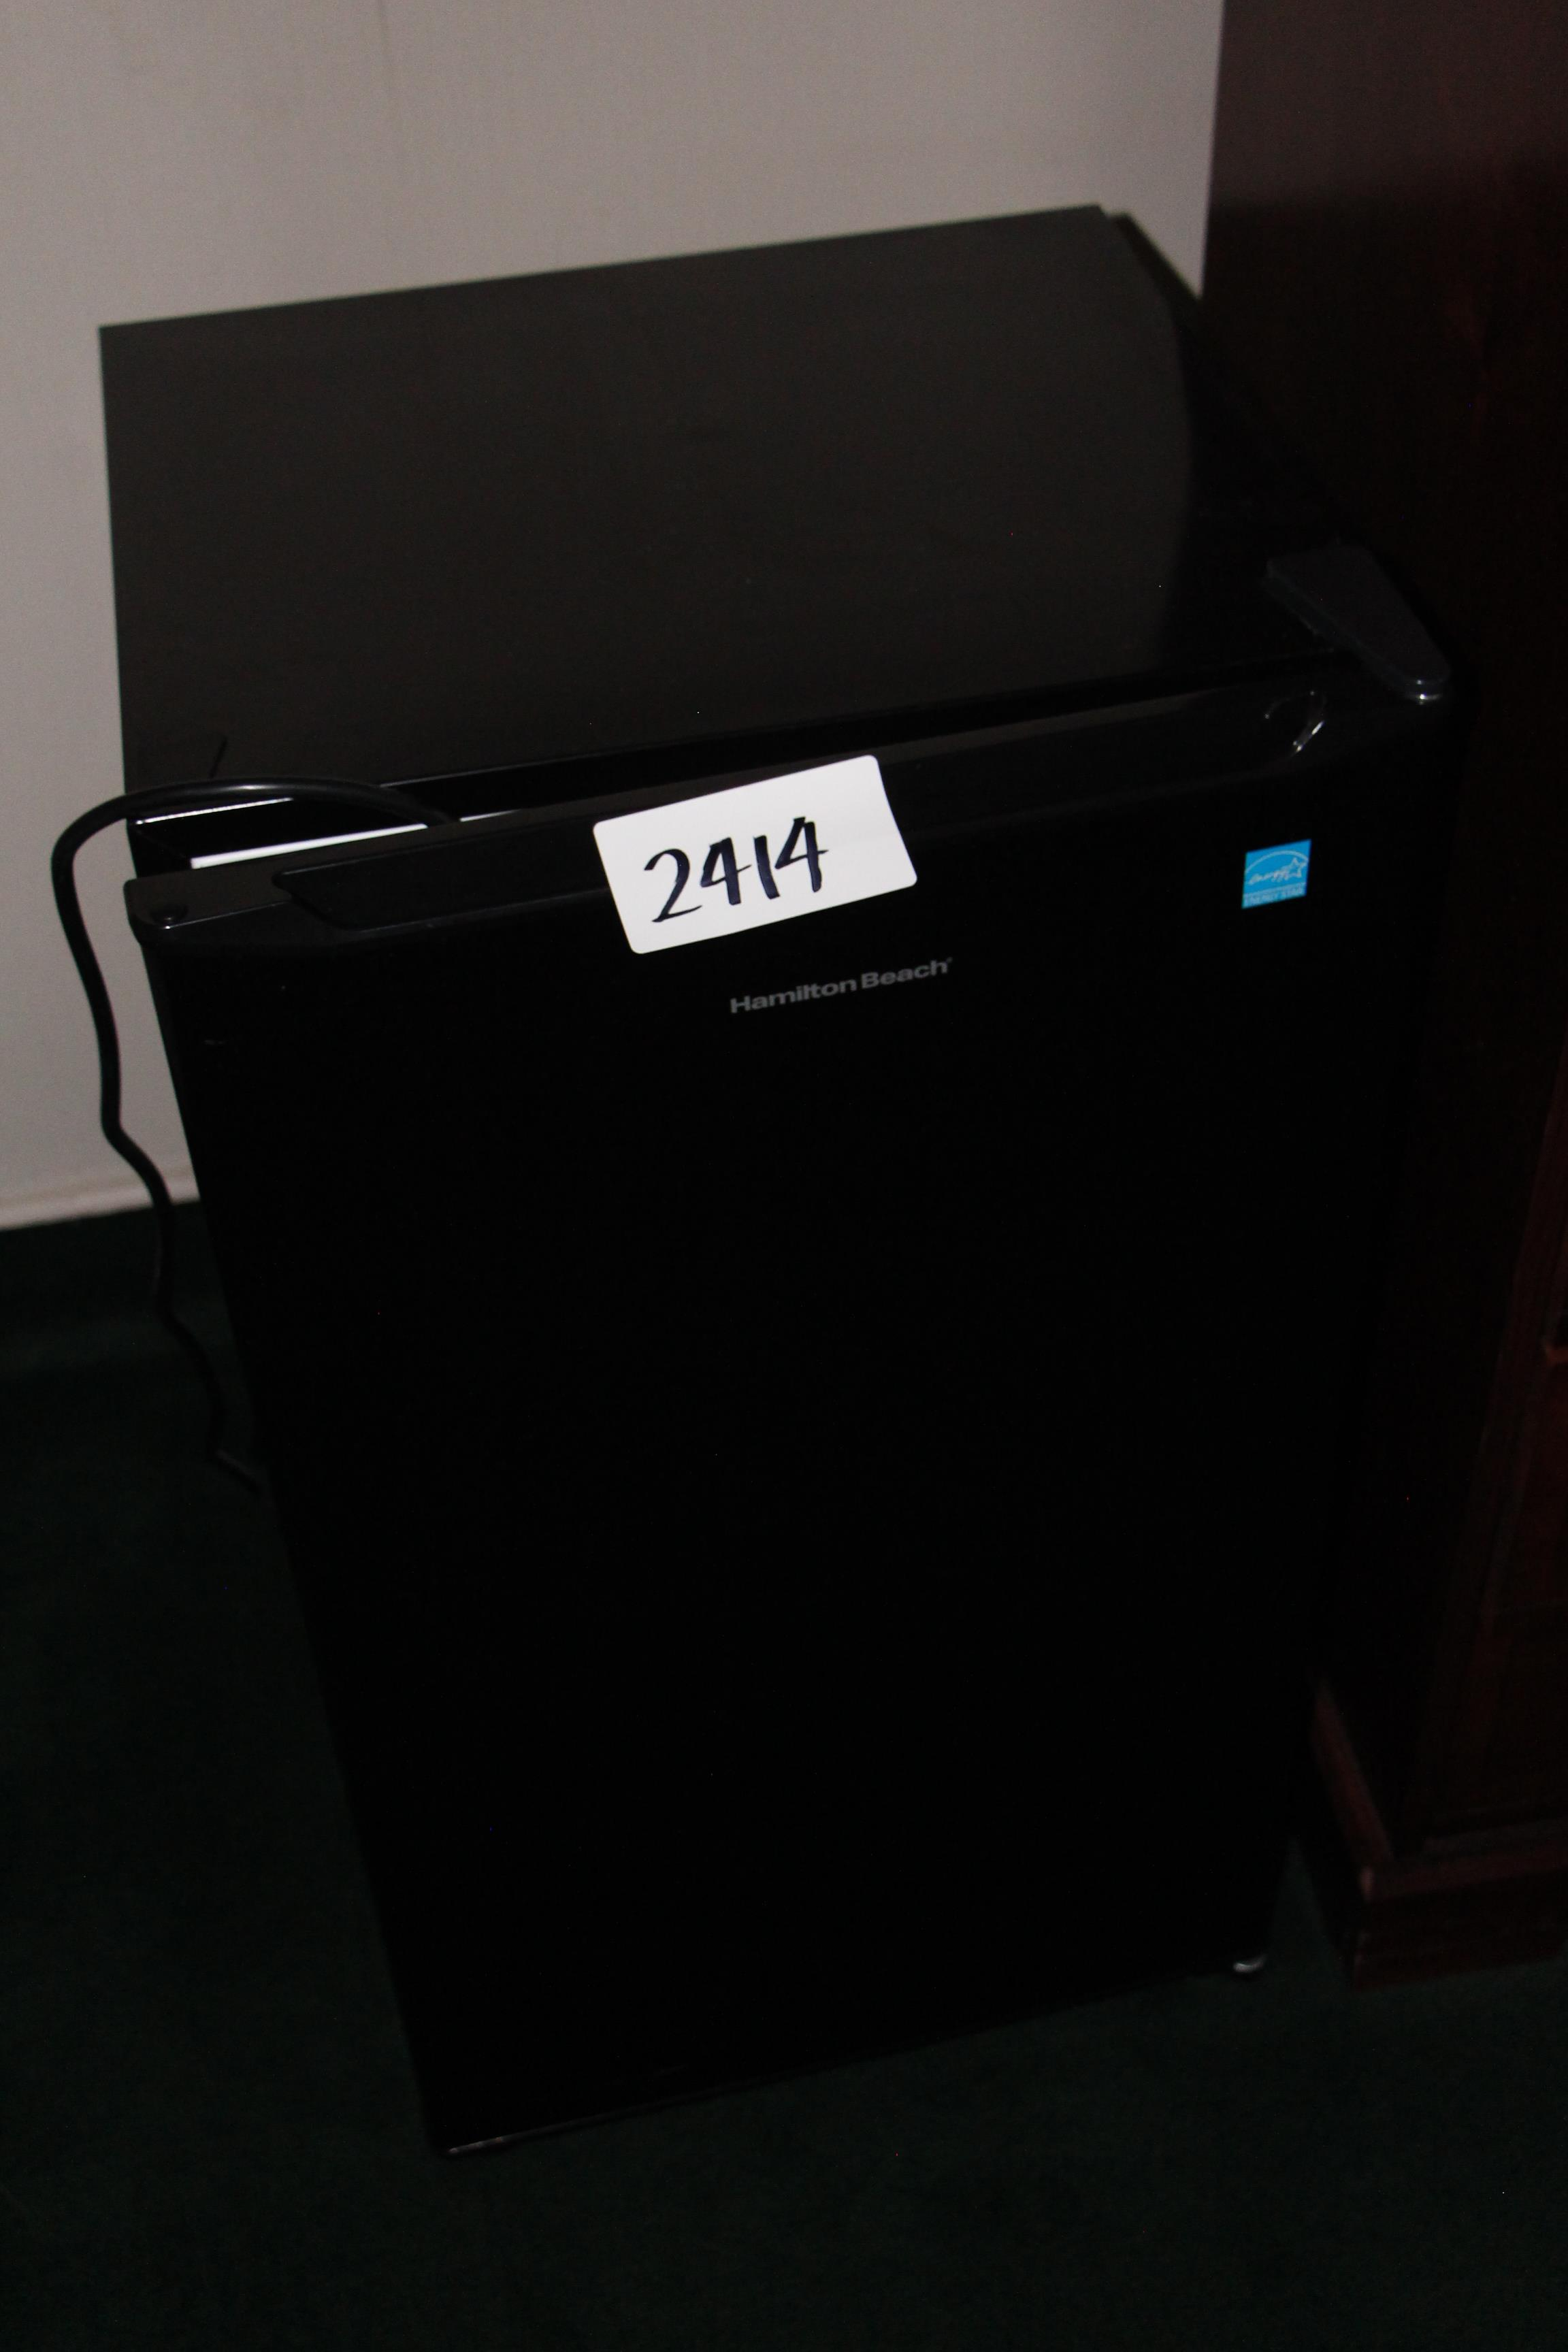 Lot 2414 - Hamilton beach bar fridge